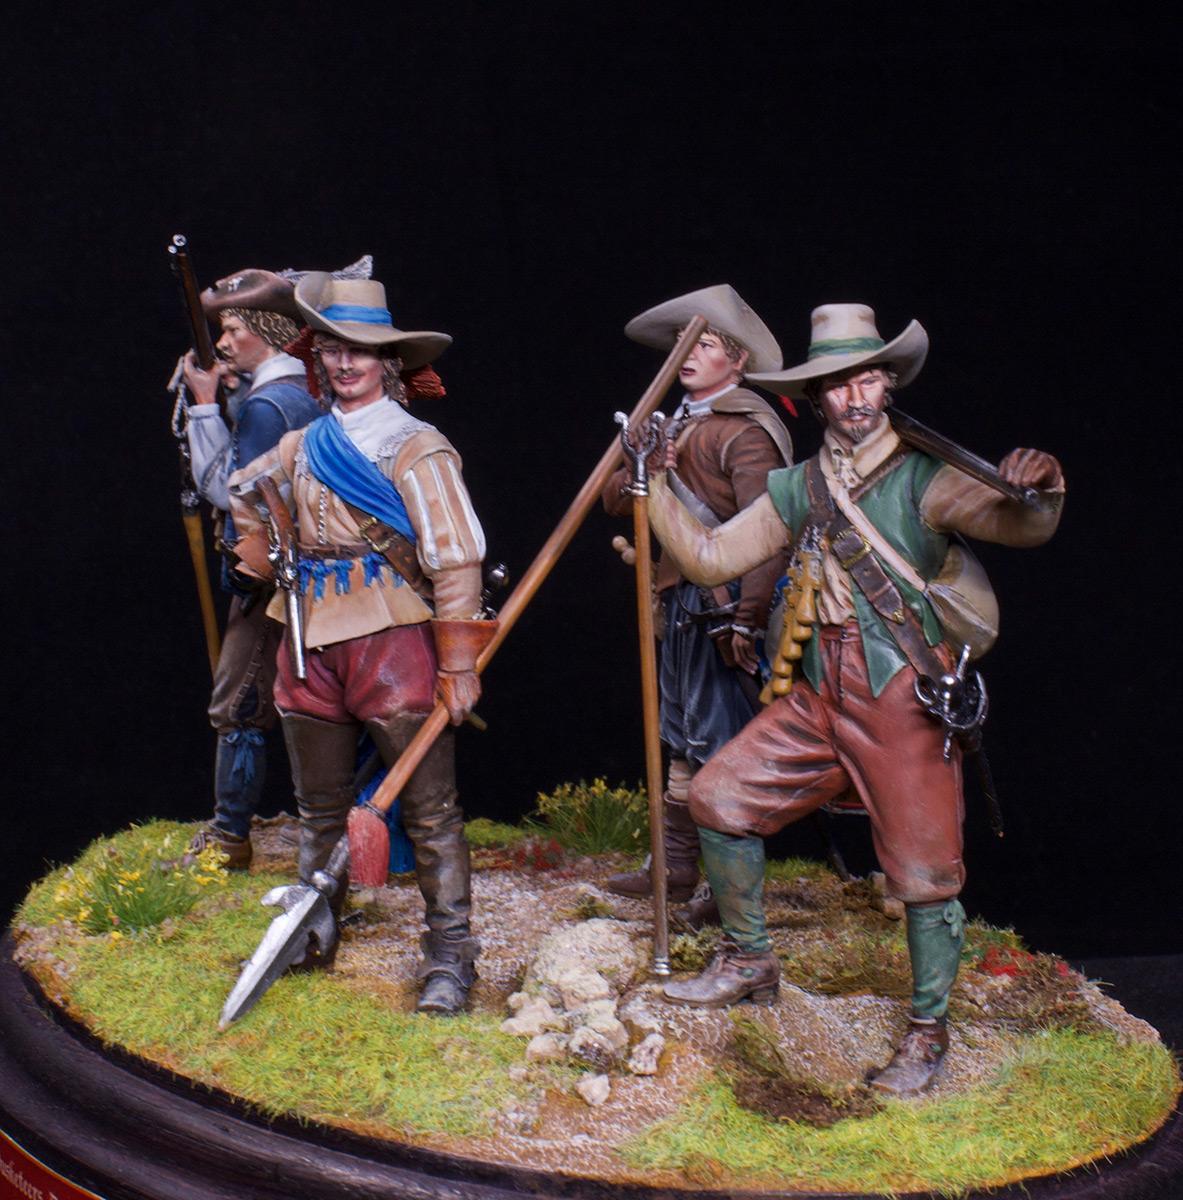 Фигурки: Мушкетеры, барабанщик и офицер, 1630 г. , фото #4